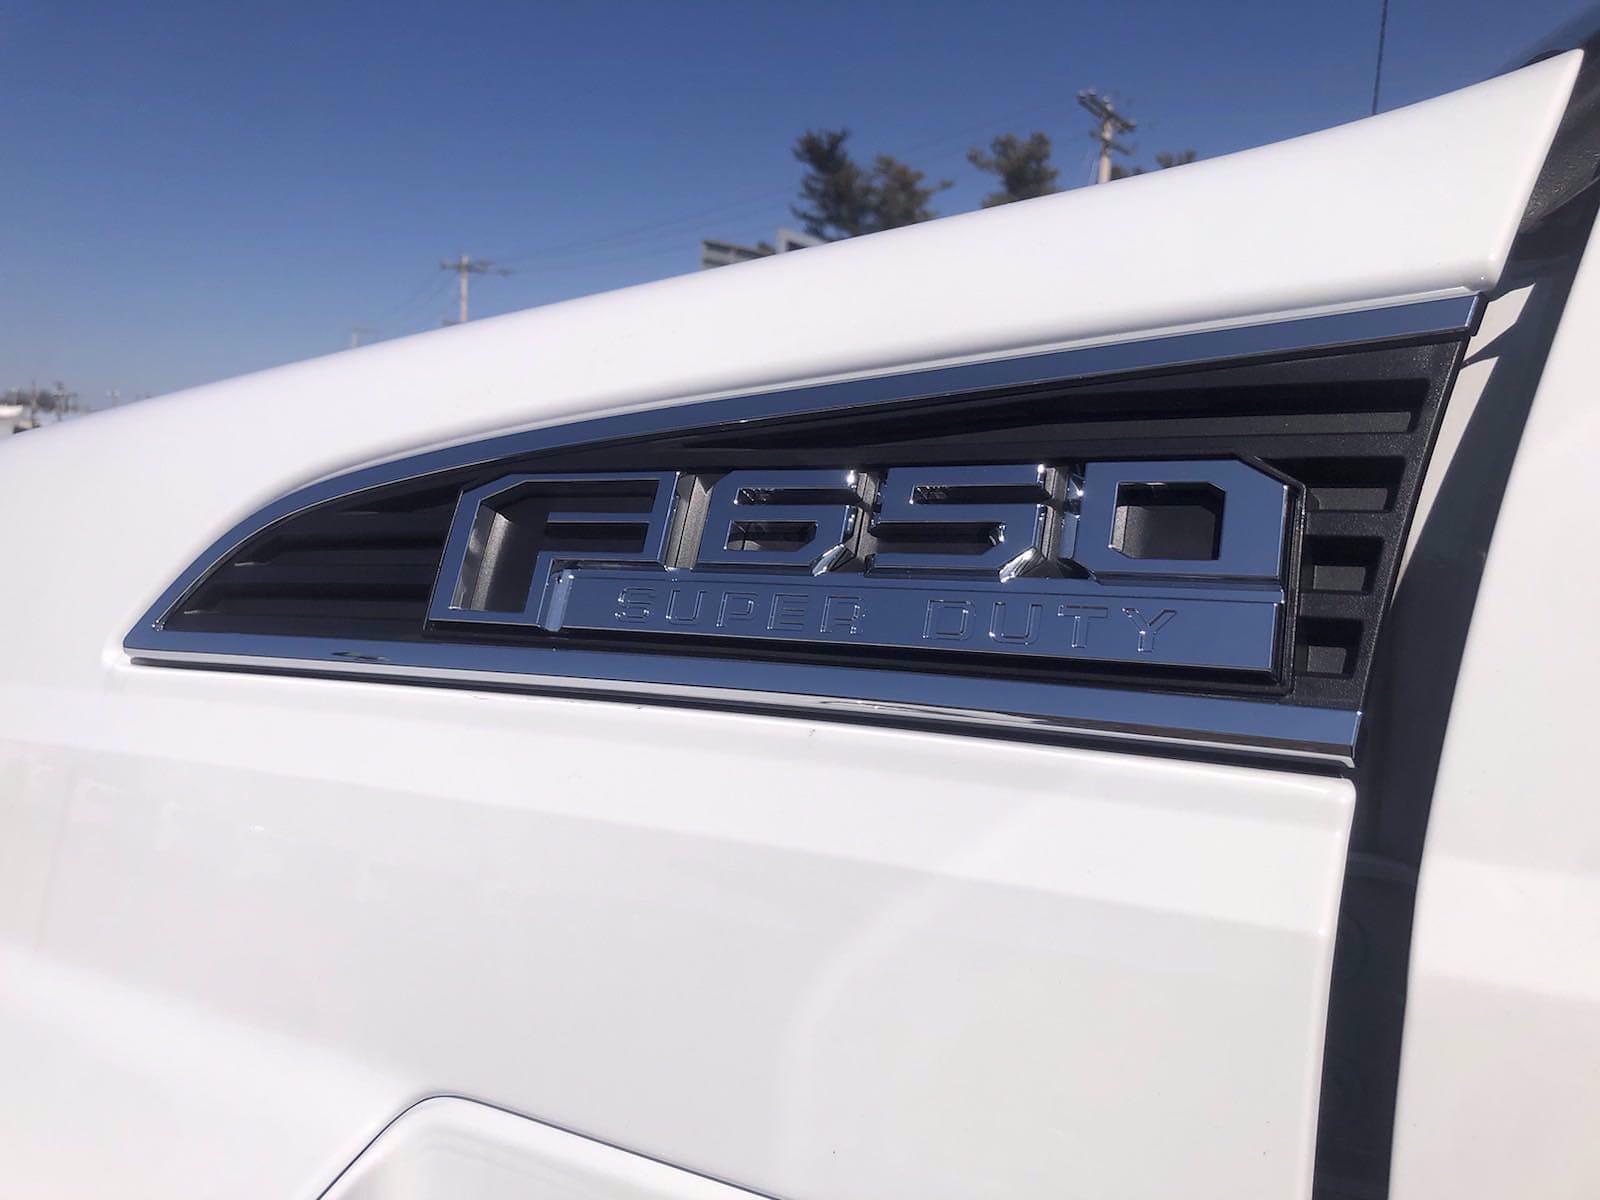 2021 Ford F-650 Regular Cab DRW 4x2, Cab Chassis #FLU00899 - photo 6